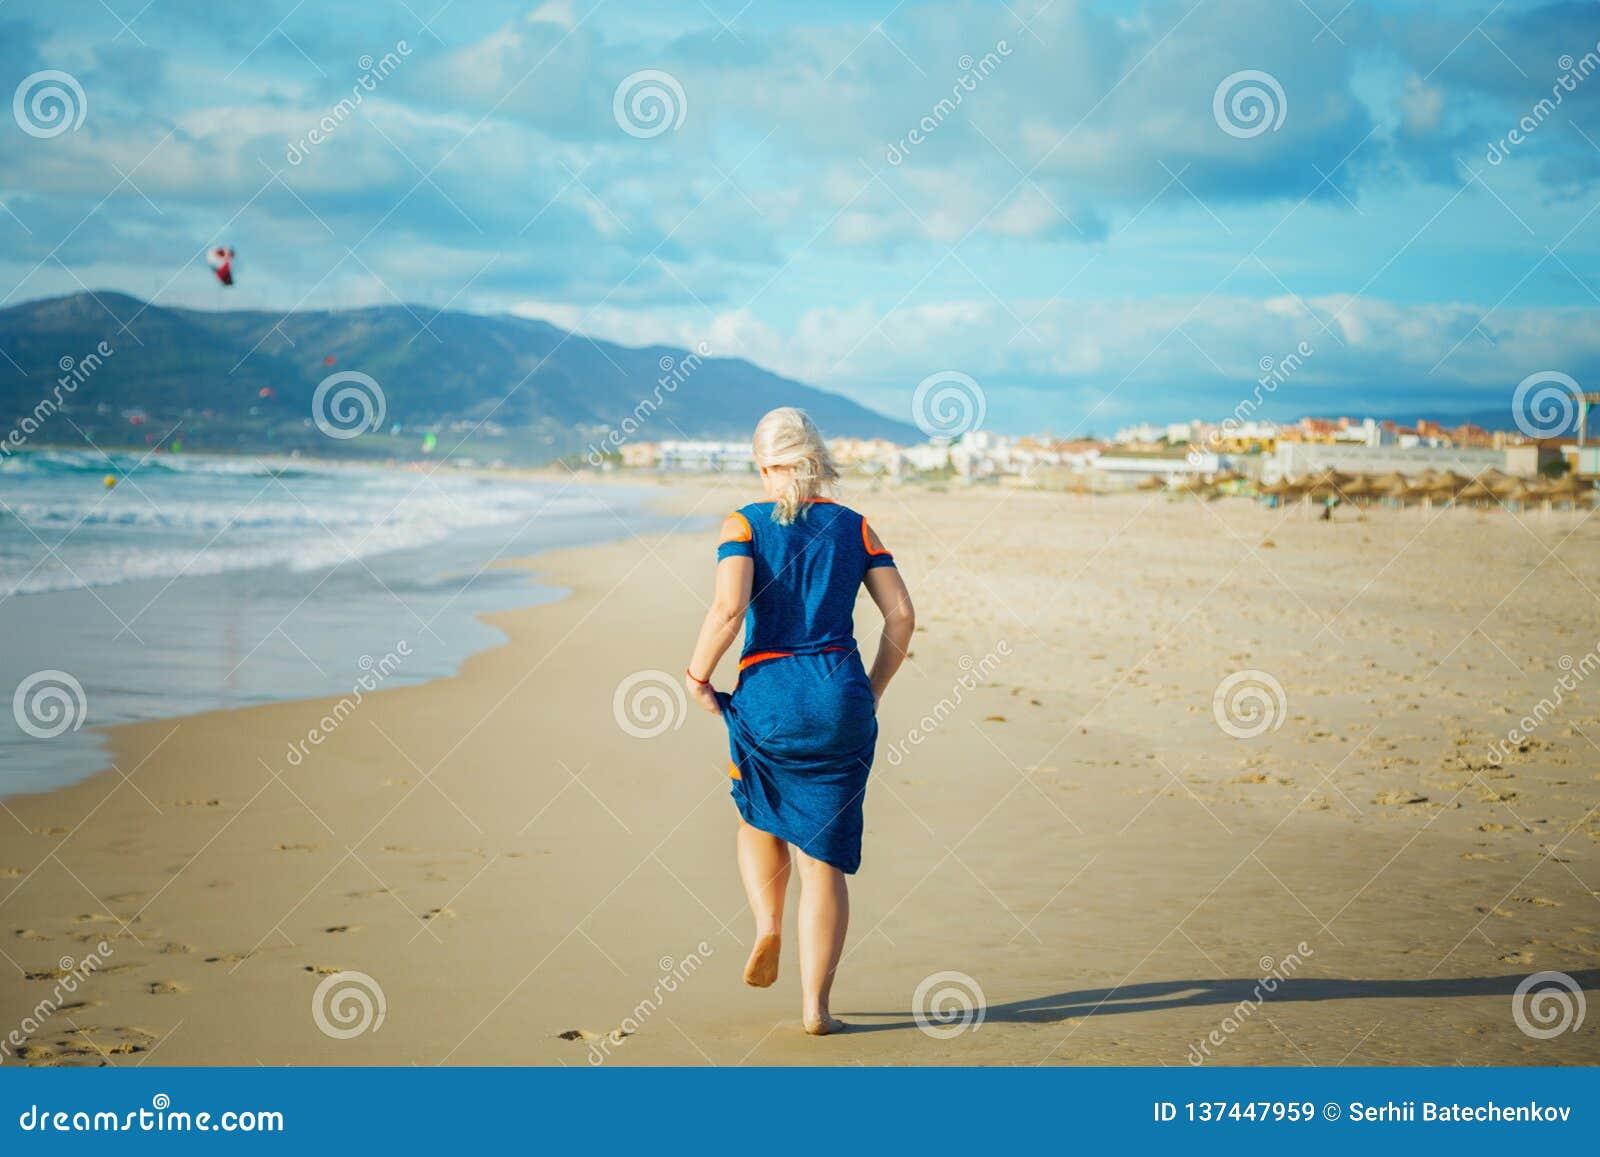 Frau läuft auf sandigem Strand